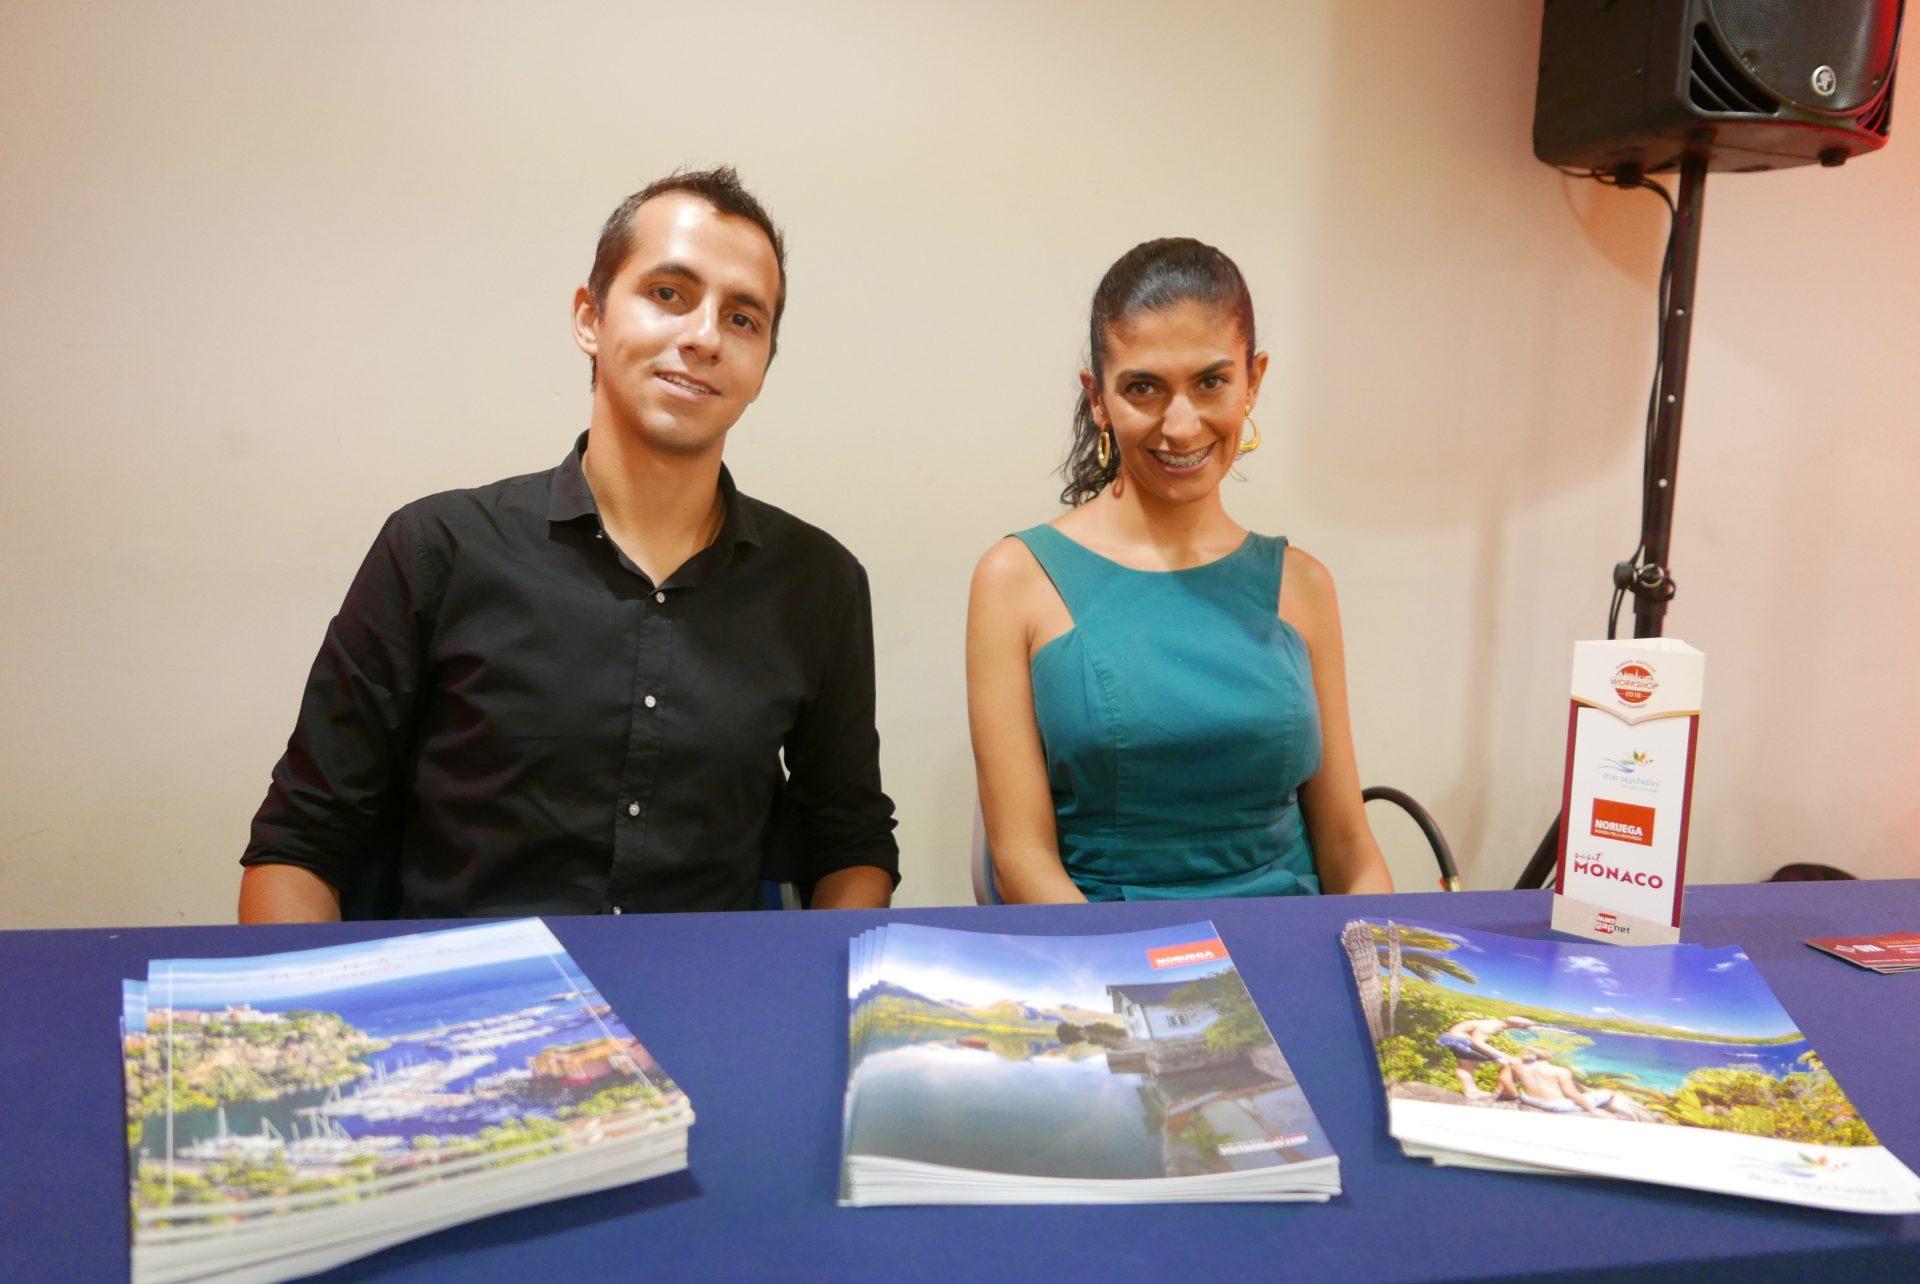 Vinicius Pereira e Juliana Khouri, da GVA, apresentaram todo o exotismo de Seychelles, Noruega e